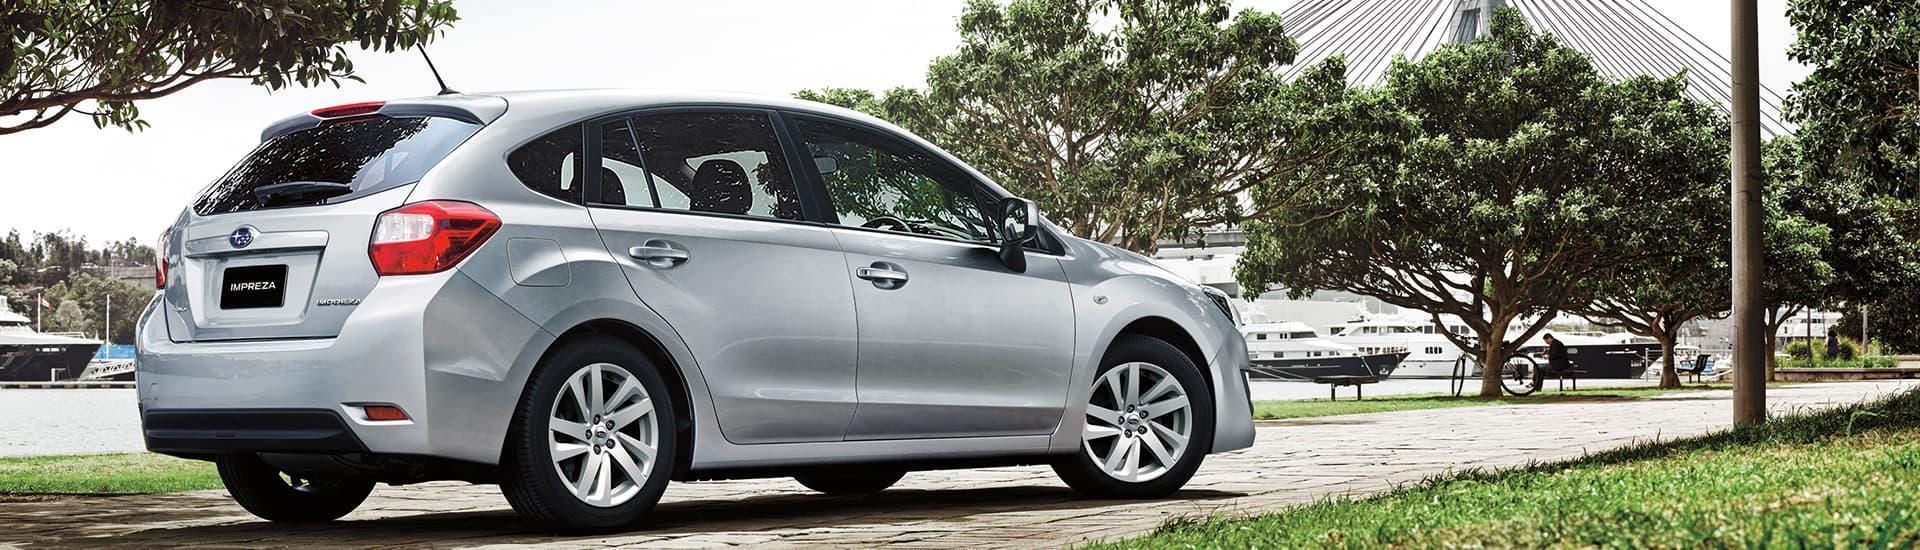 Subaru Certified Used Cars Pre-Owned Cars - Premium Used Cars ...